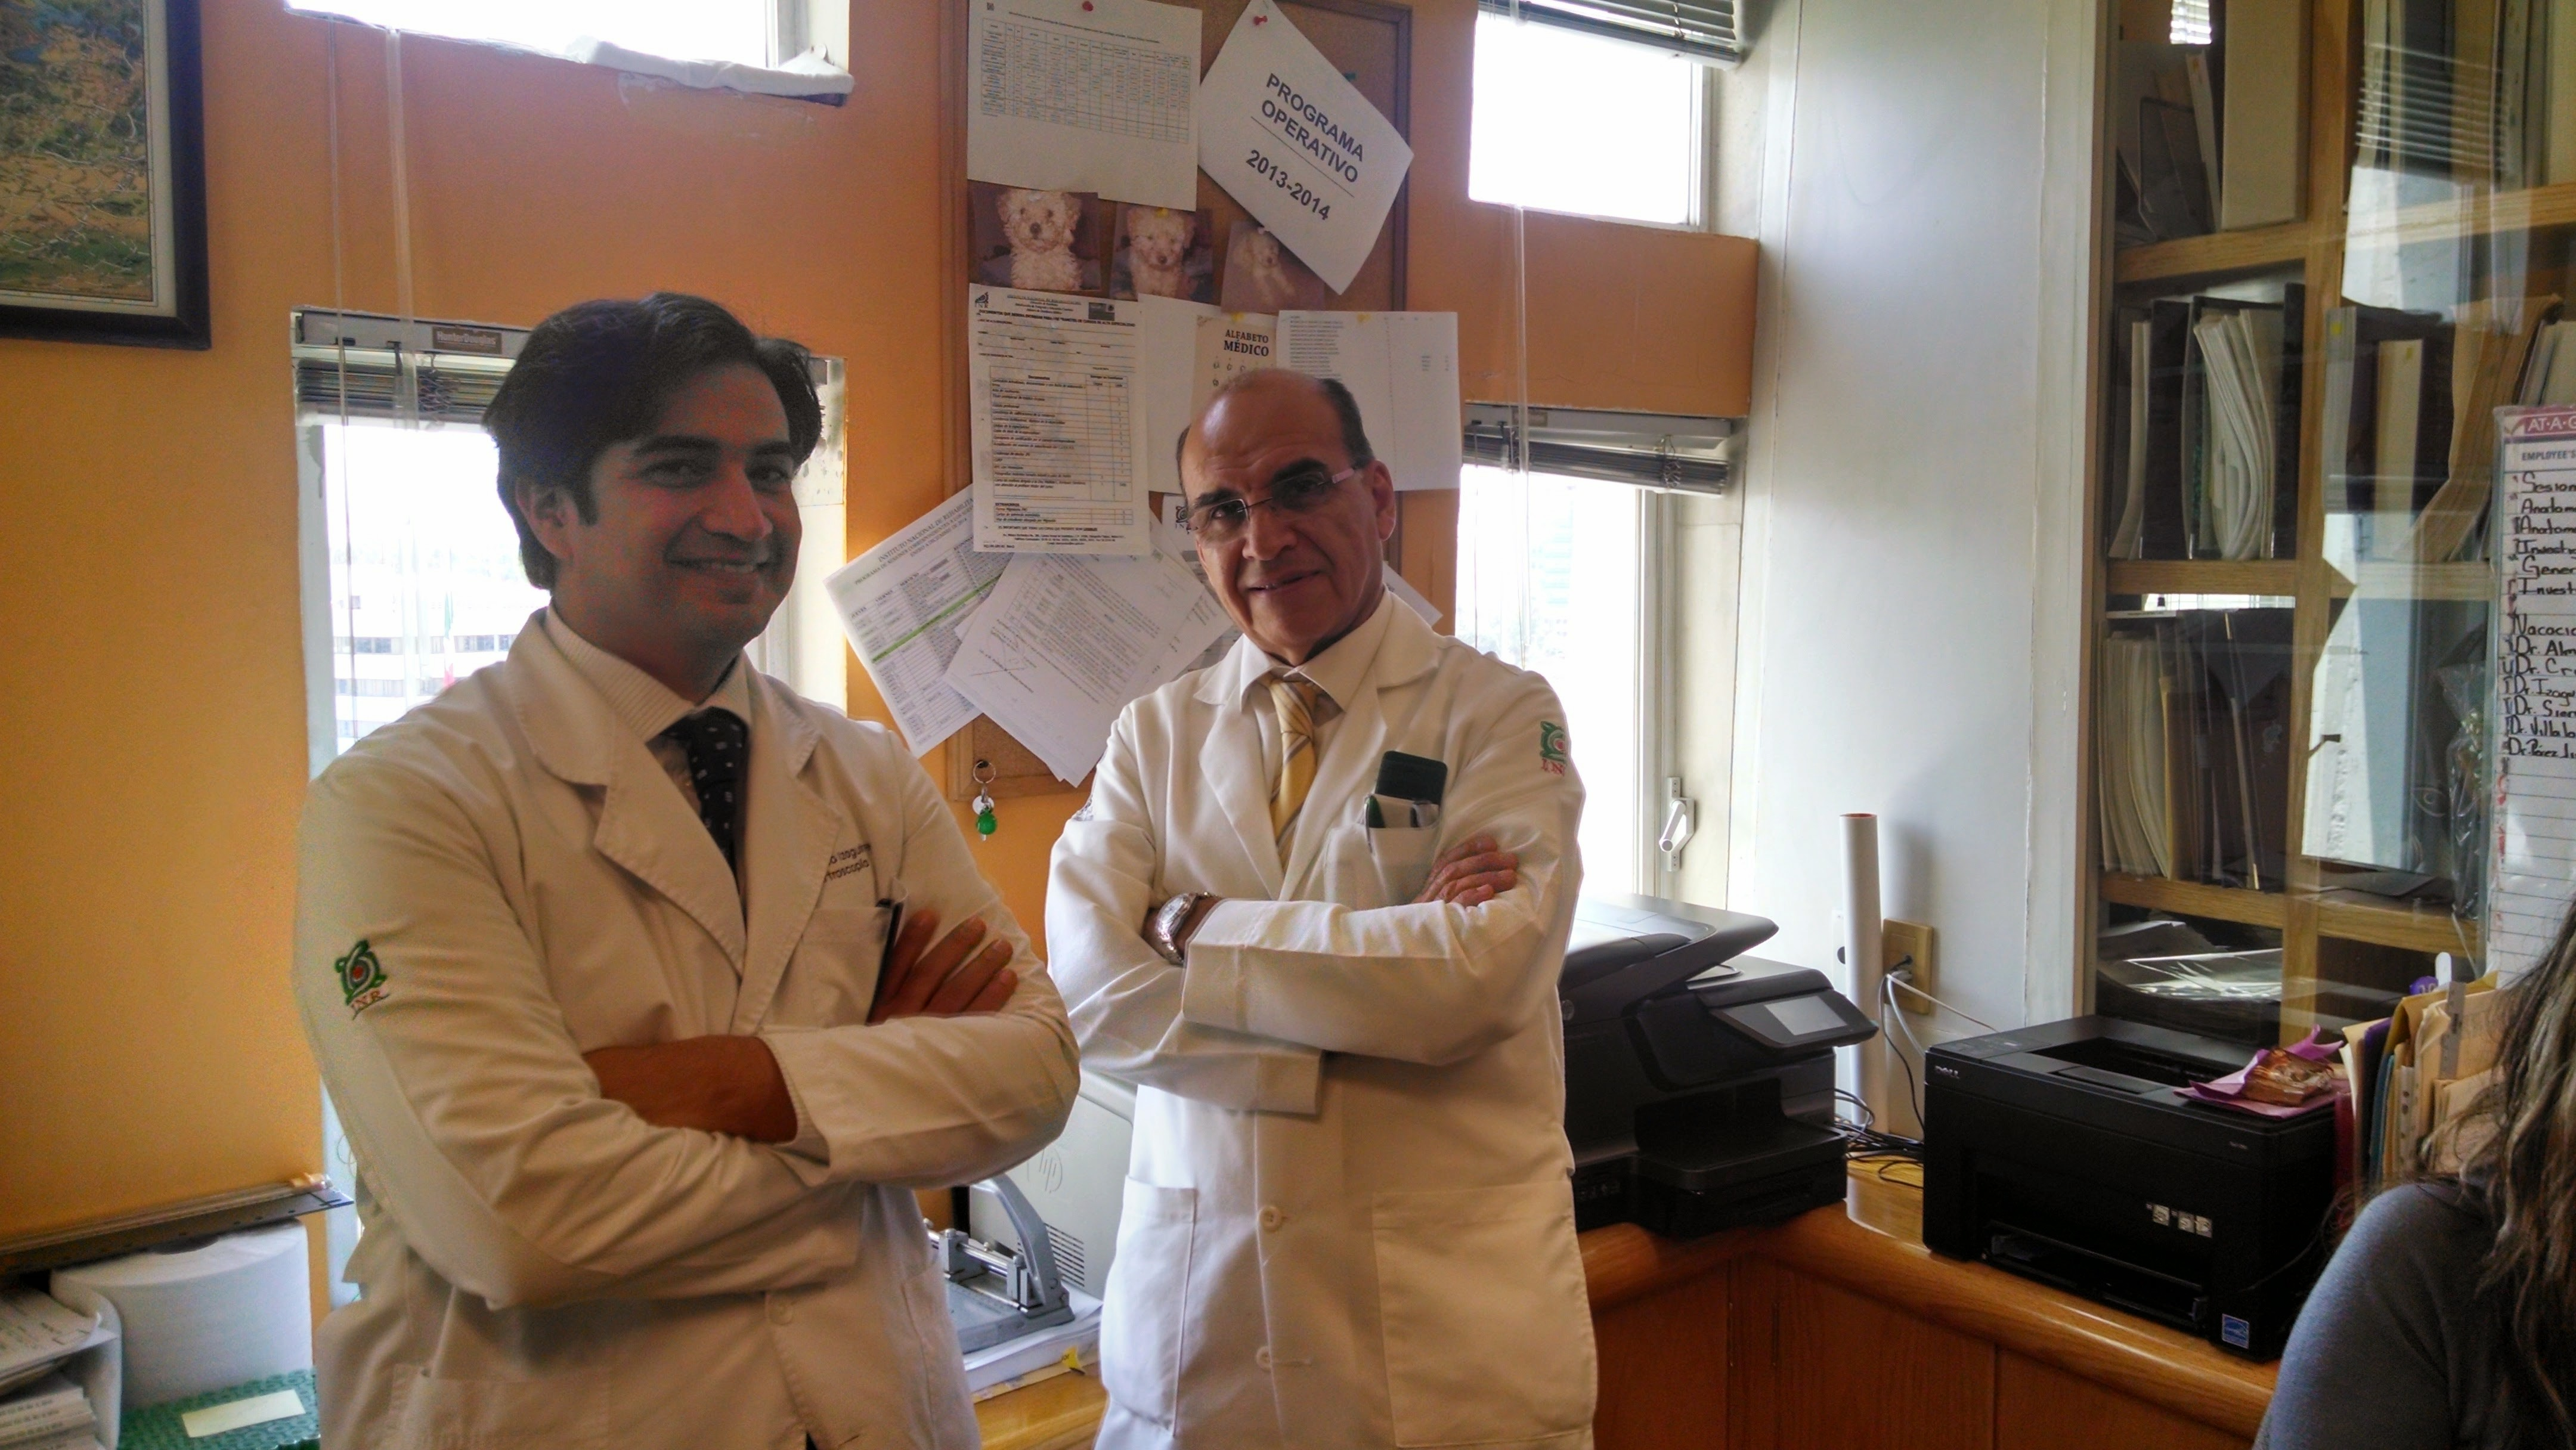 ¡Recordatorio! #Webinar Jornadas de Actualización de AEA en #Artroscopia de #Hombro 7 de septiembre